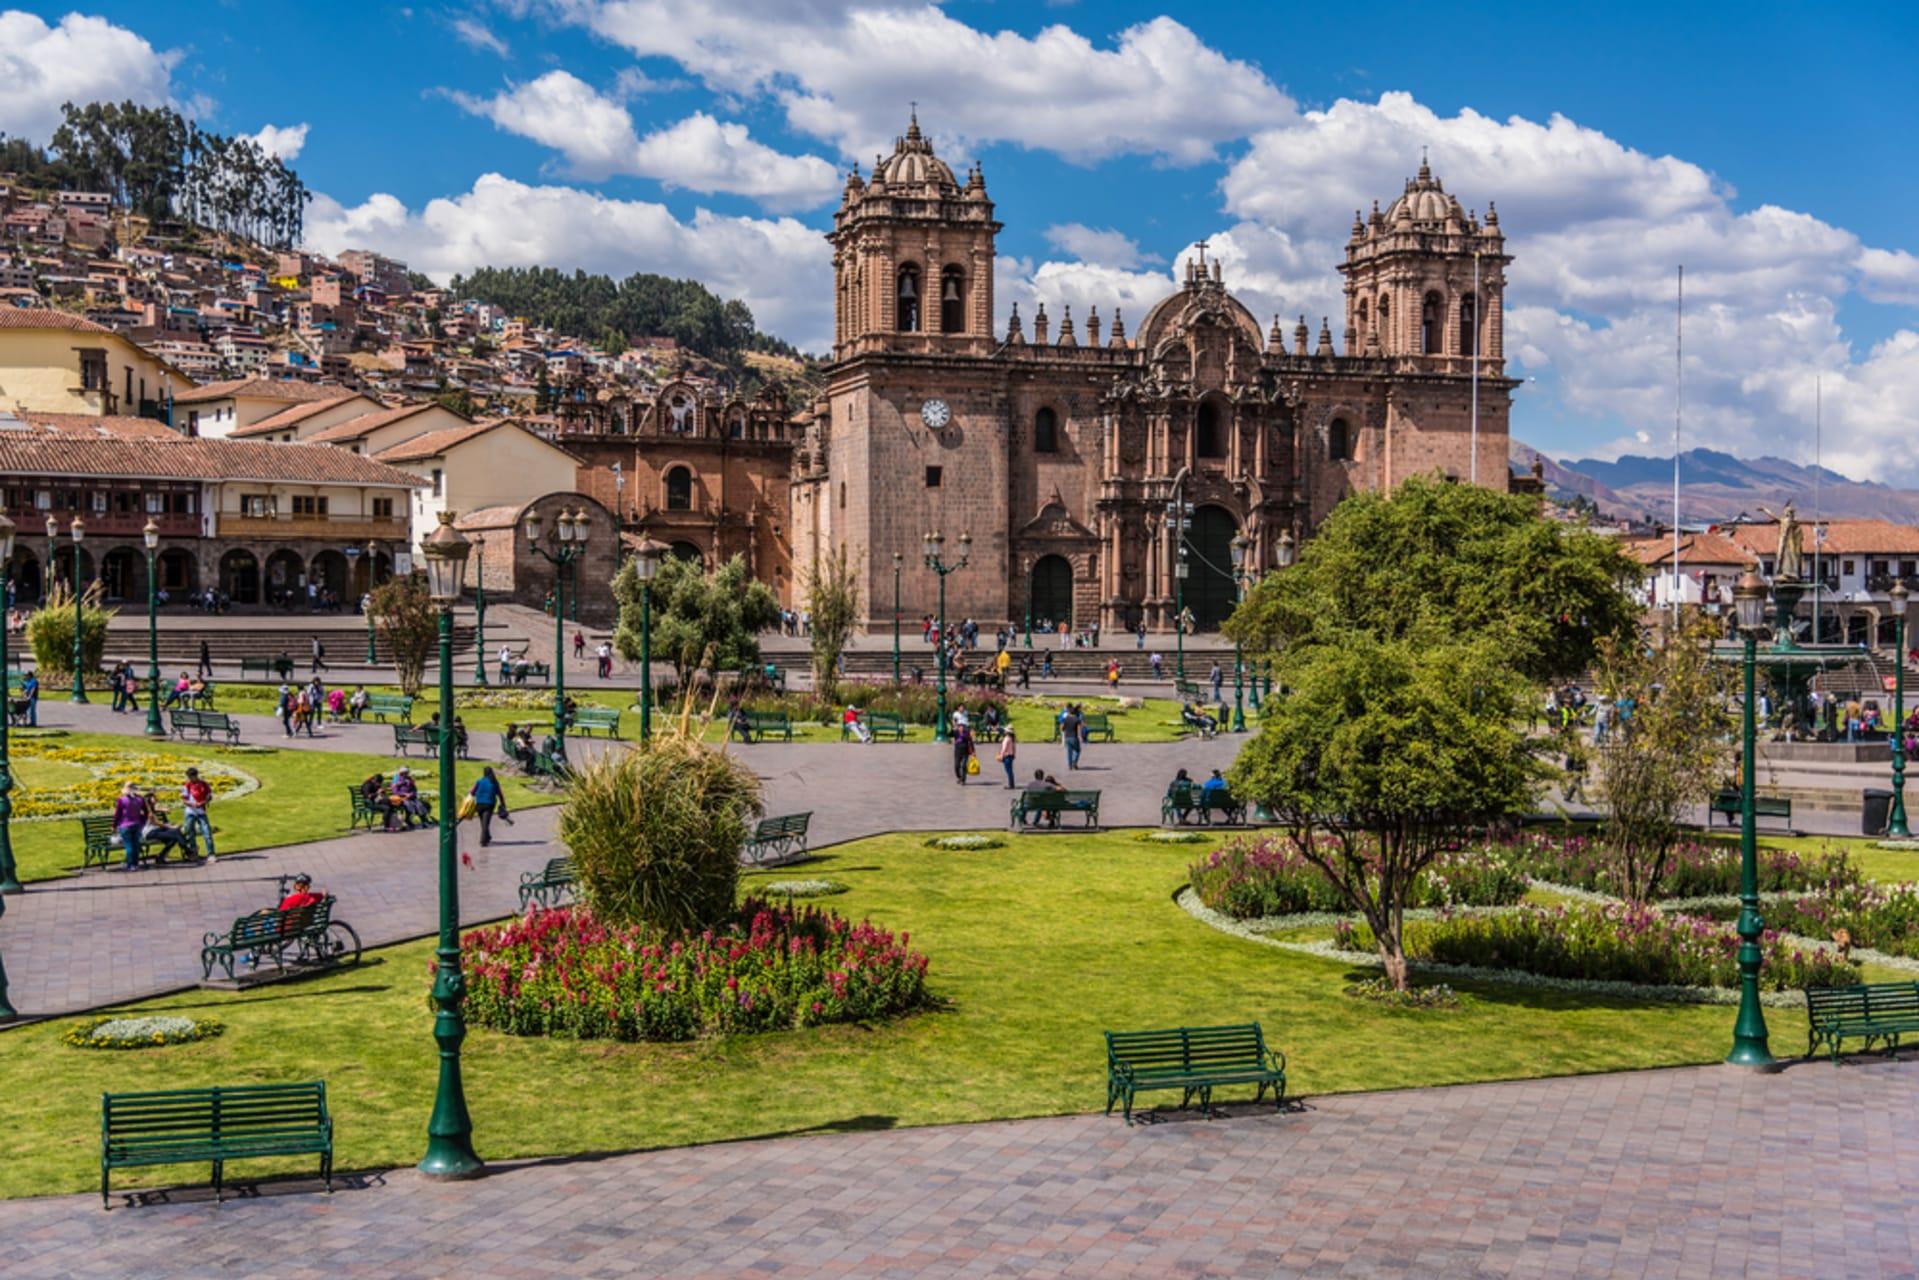 Cusco - Cusco: The Inca Capital